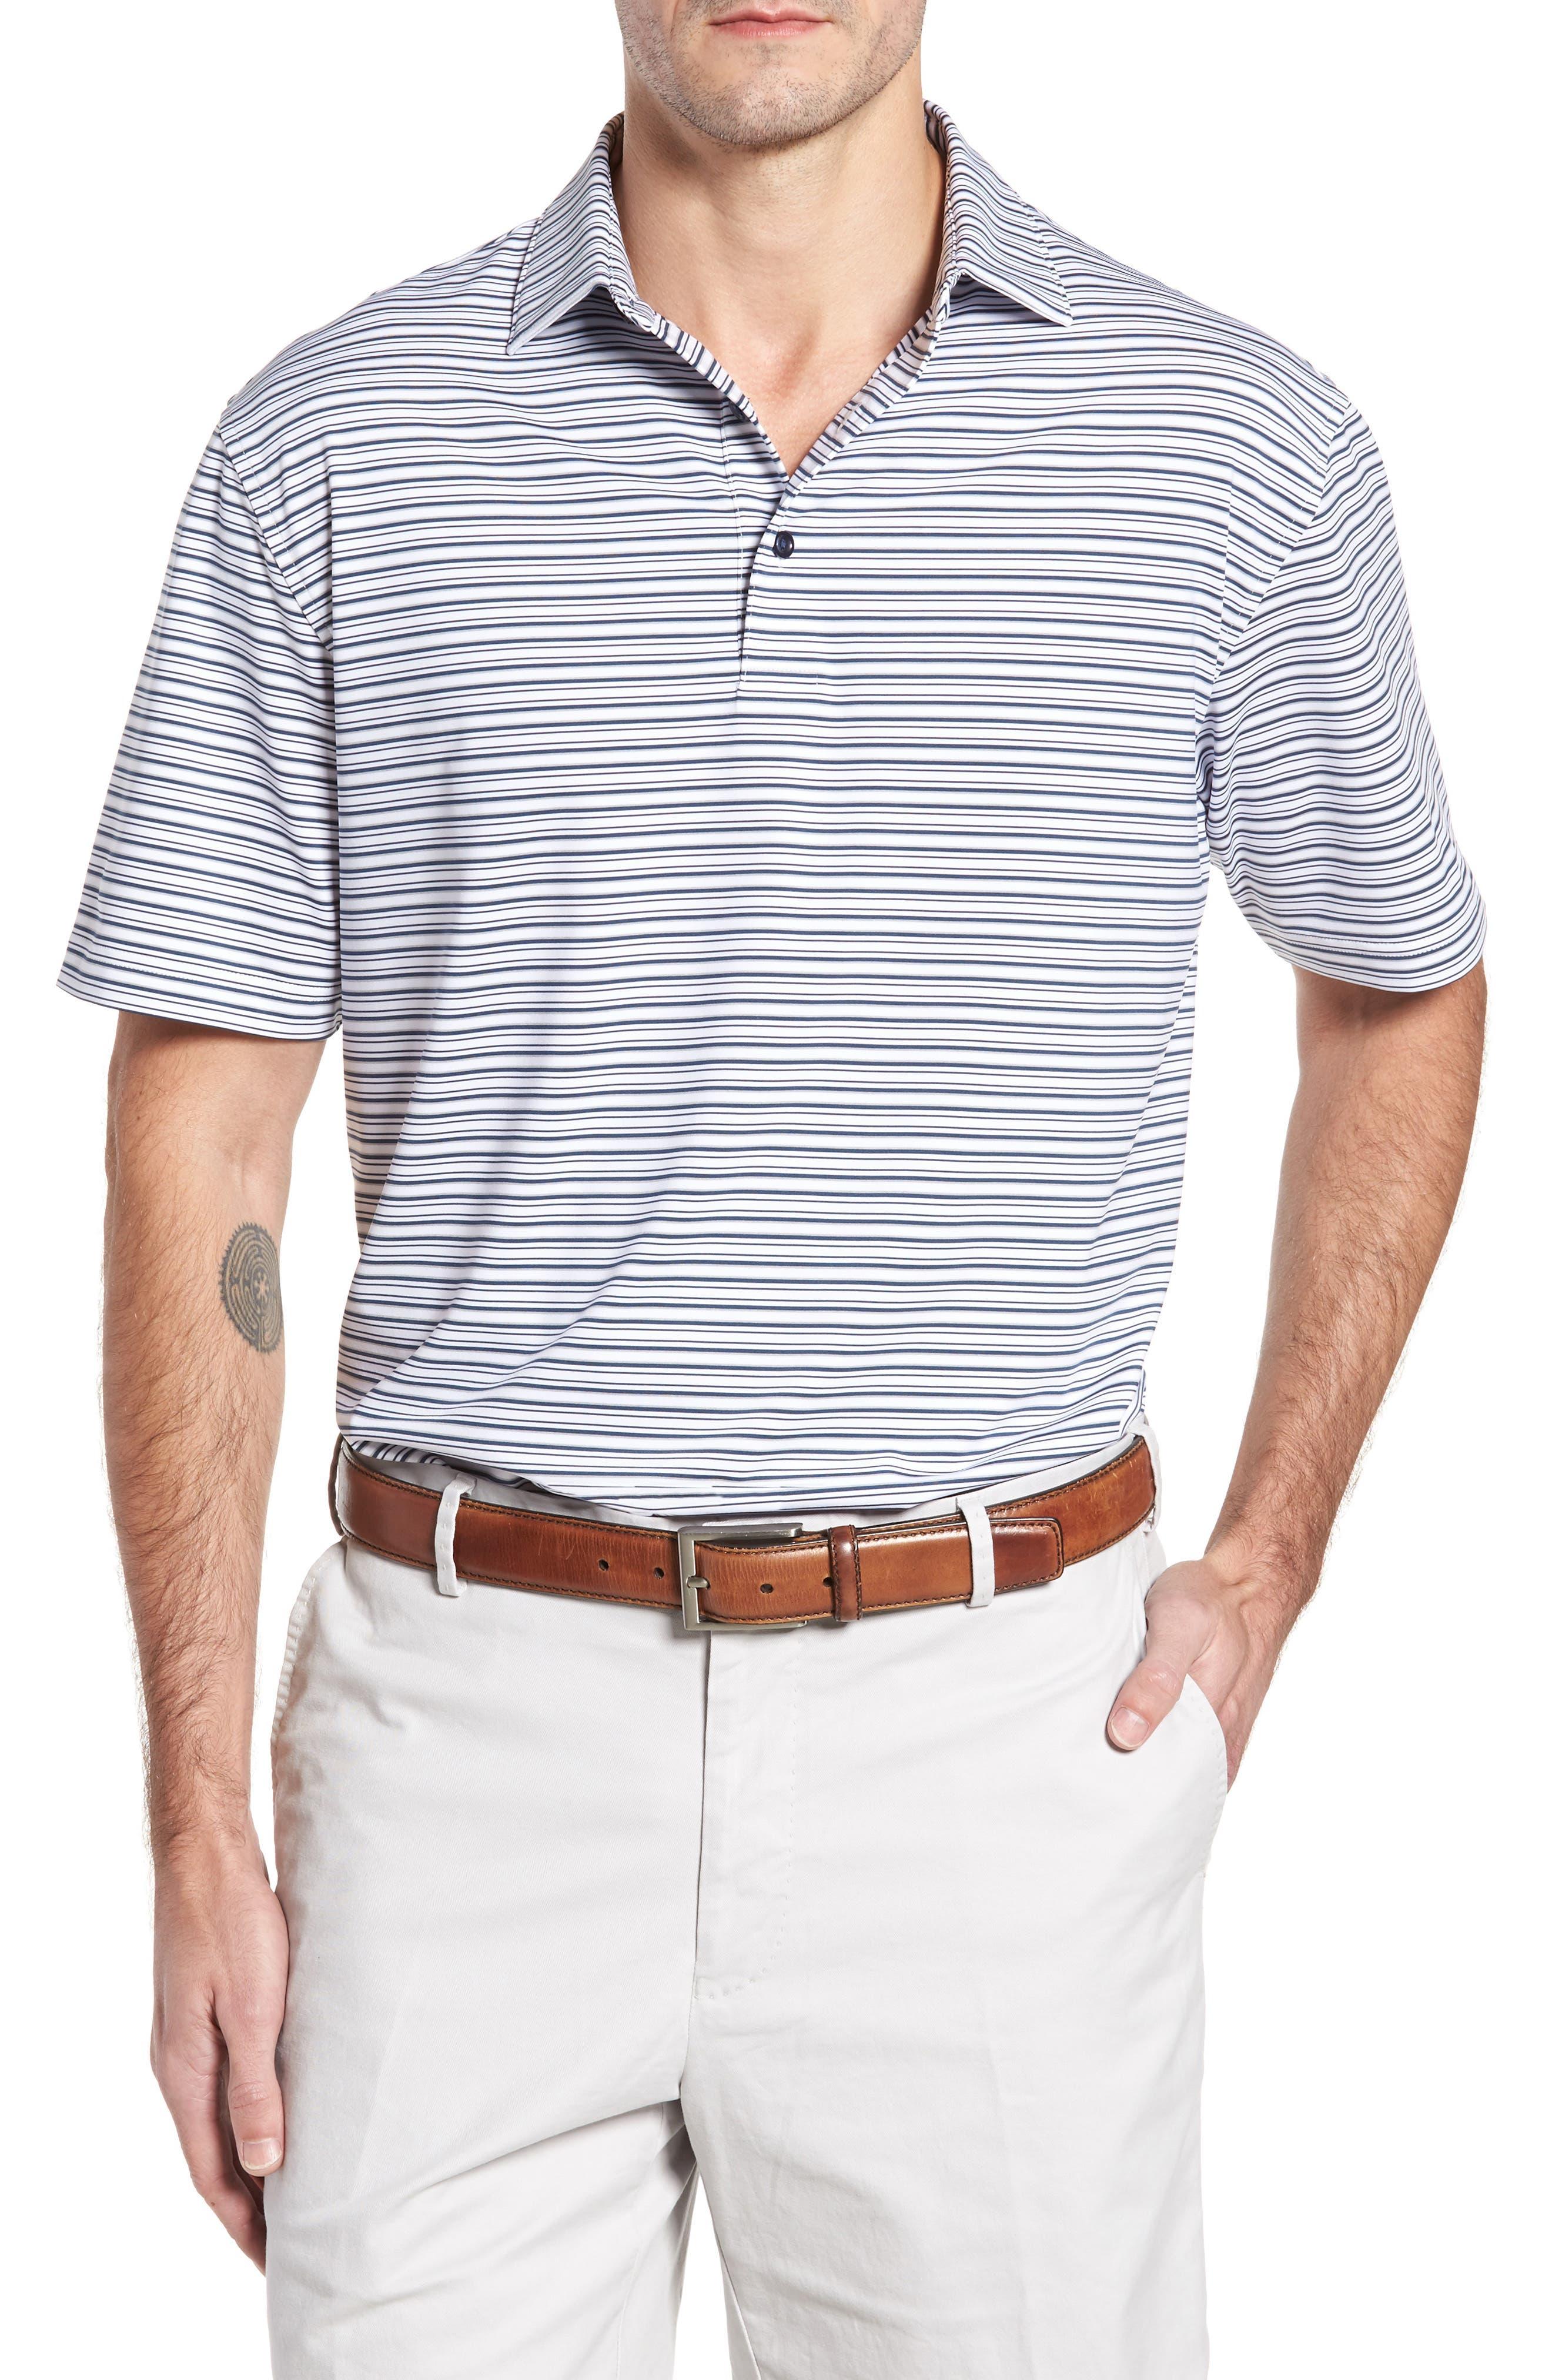 Peter Millar Barron Sean Stripe Jersey Polo